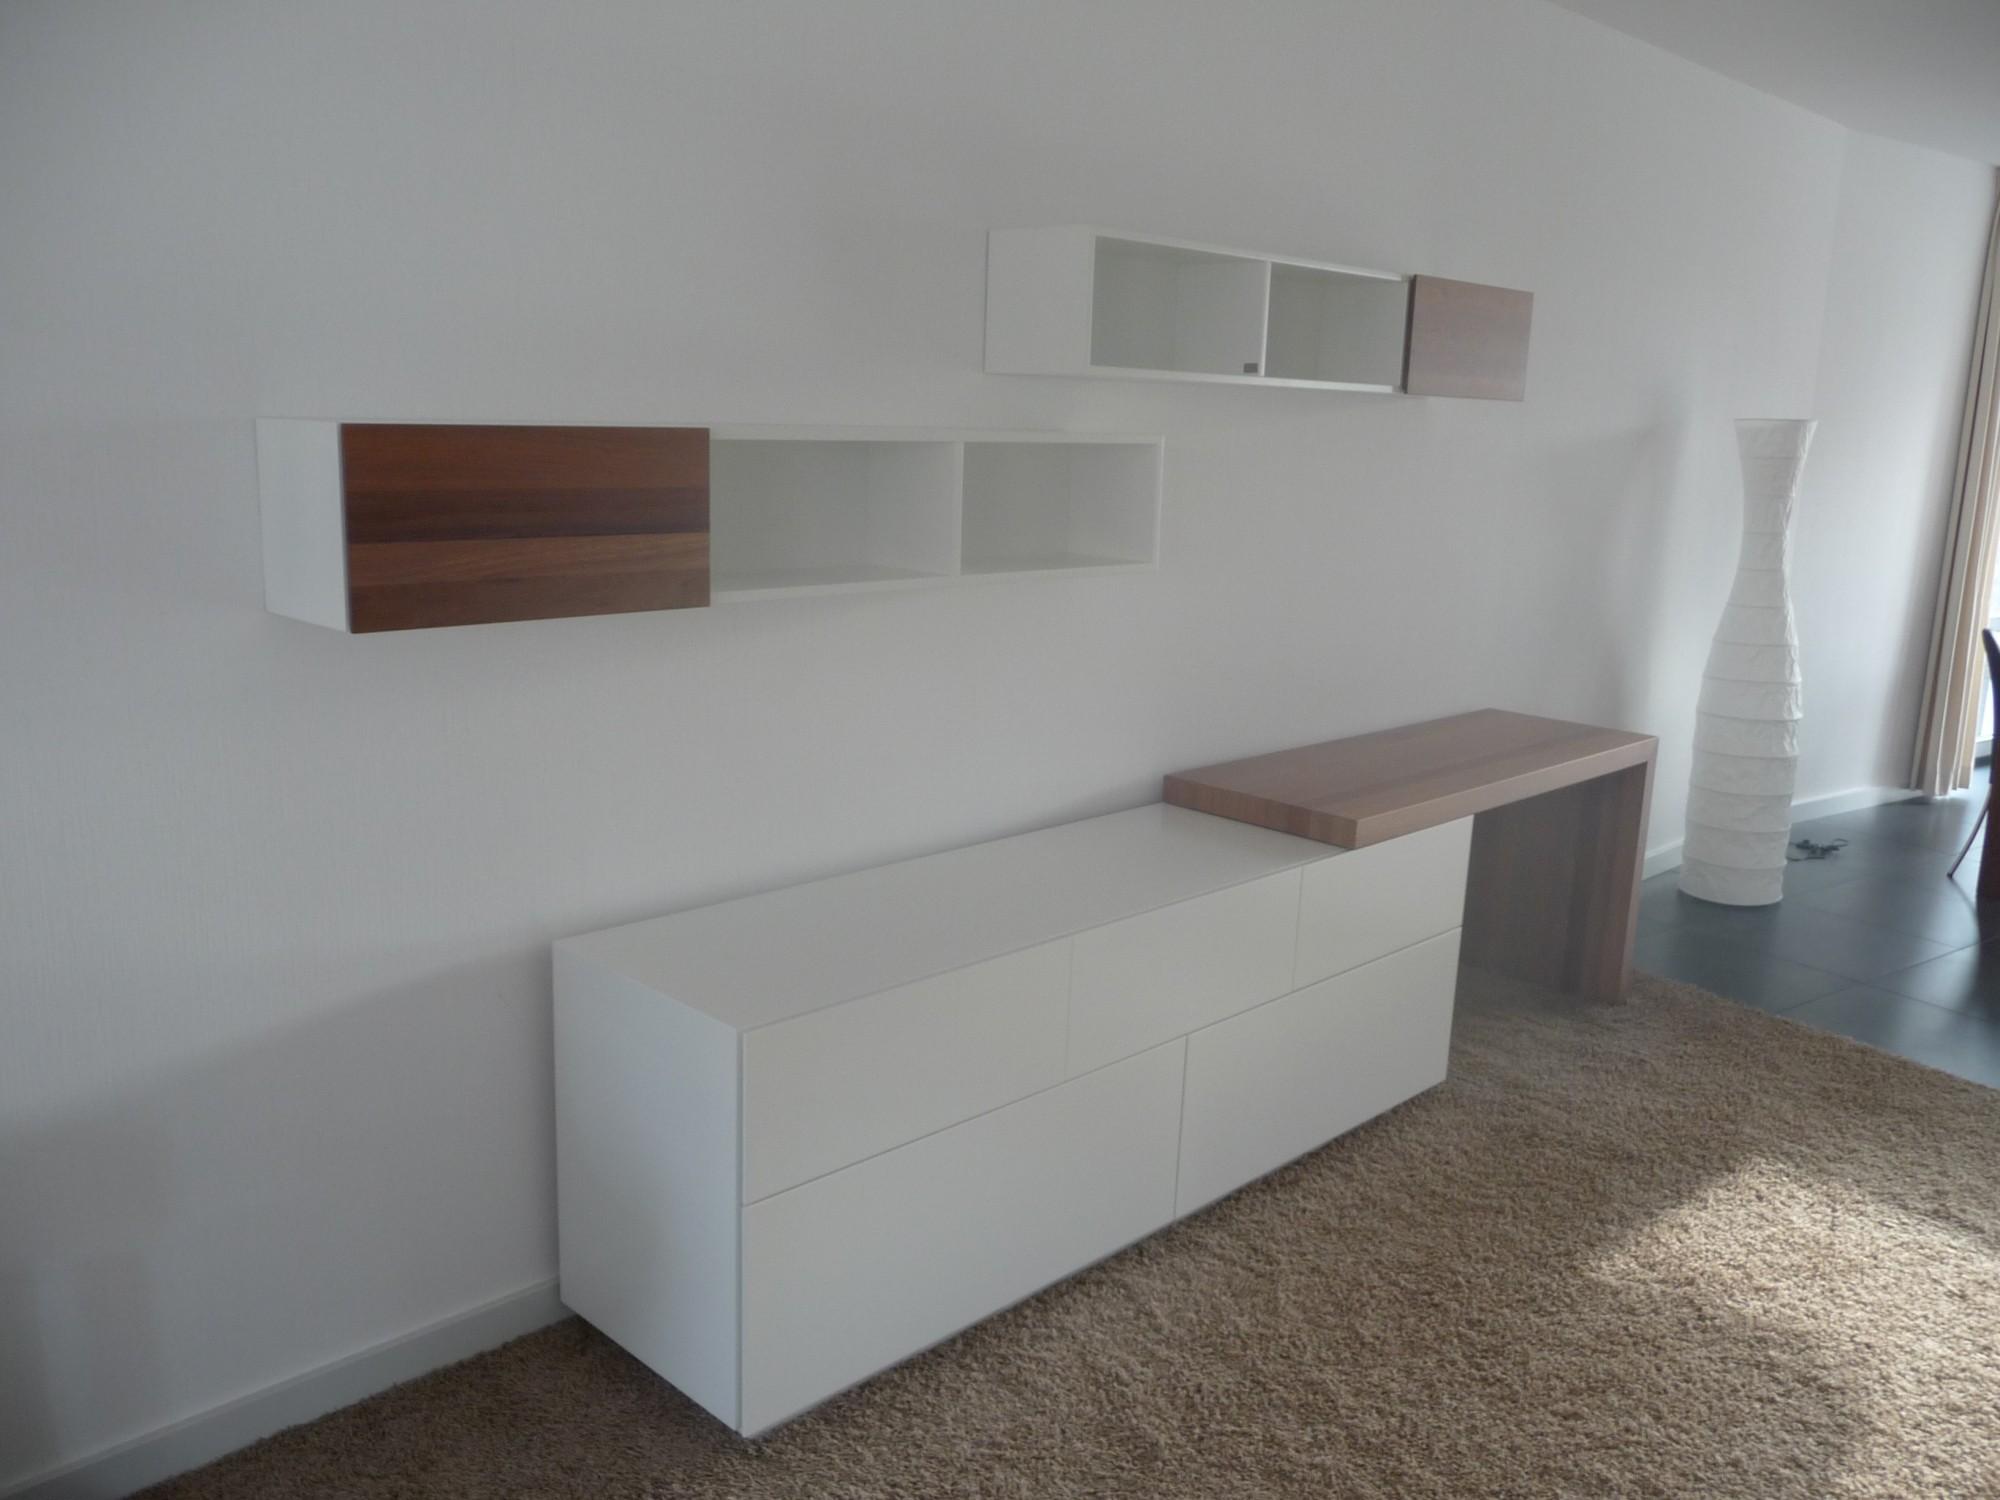 Wandmeubel Met Bureau.Design Wandmeubel Op Maat Puur Interiors